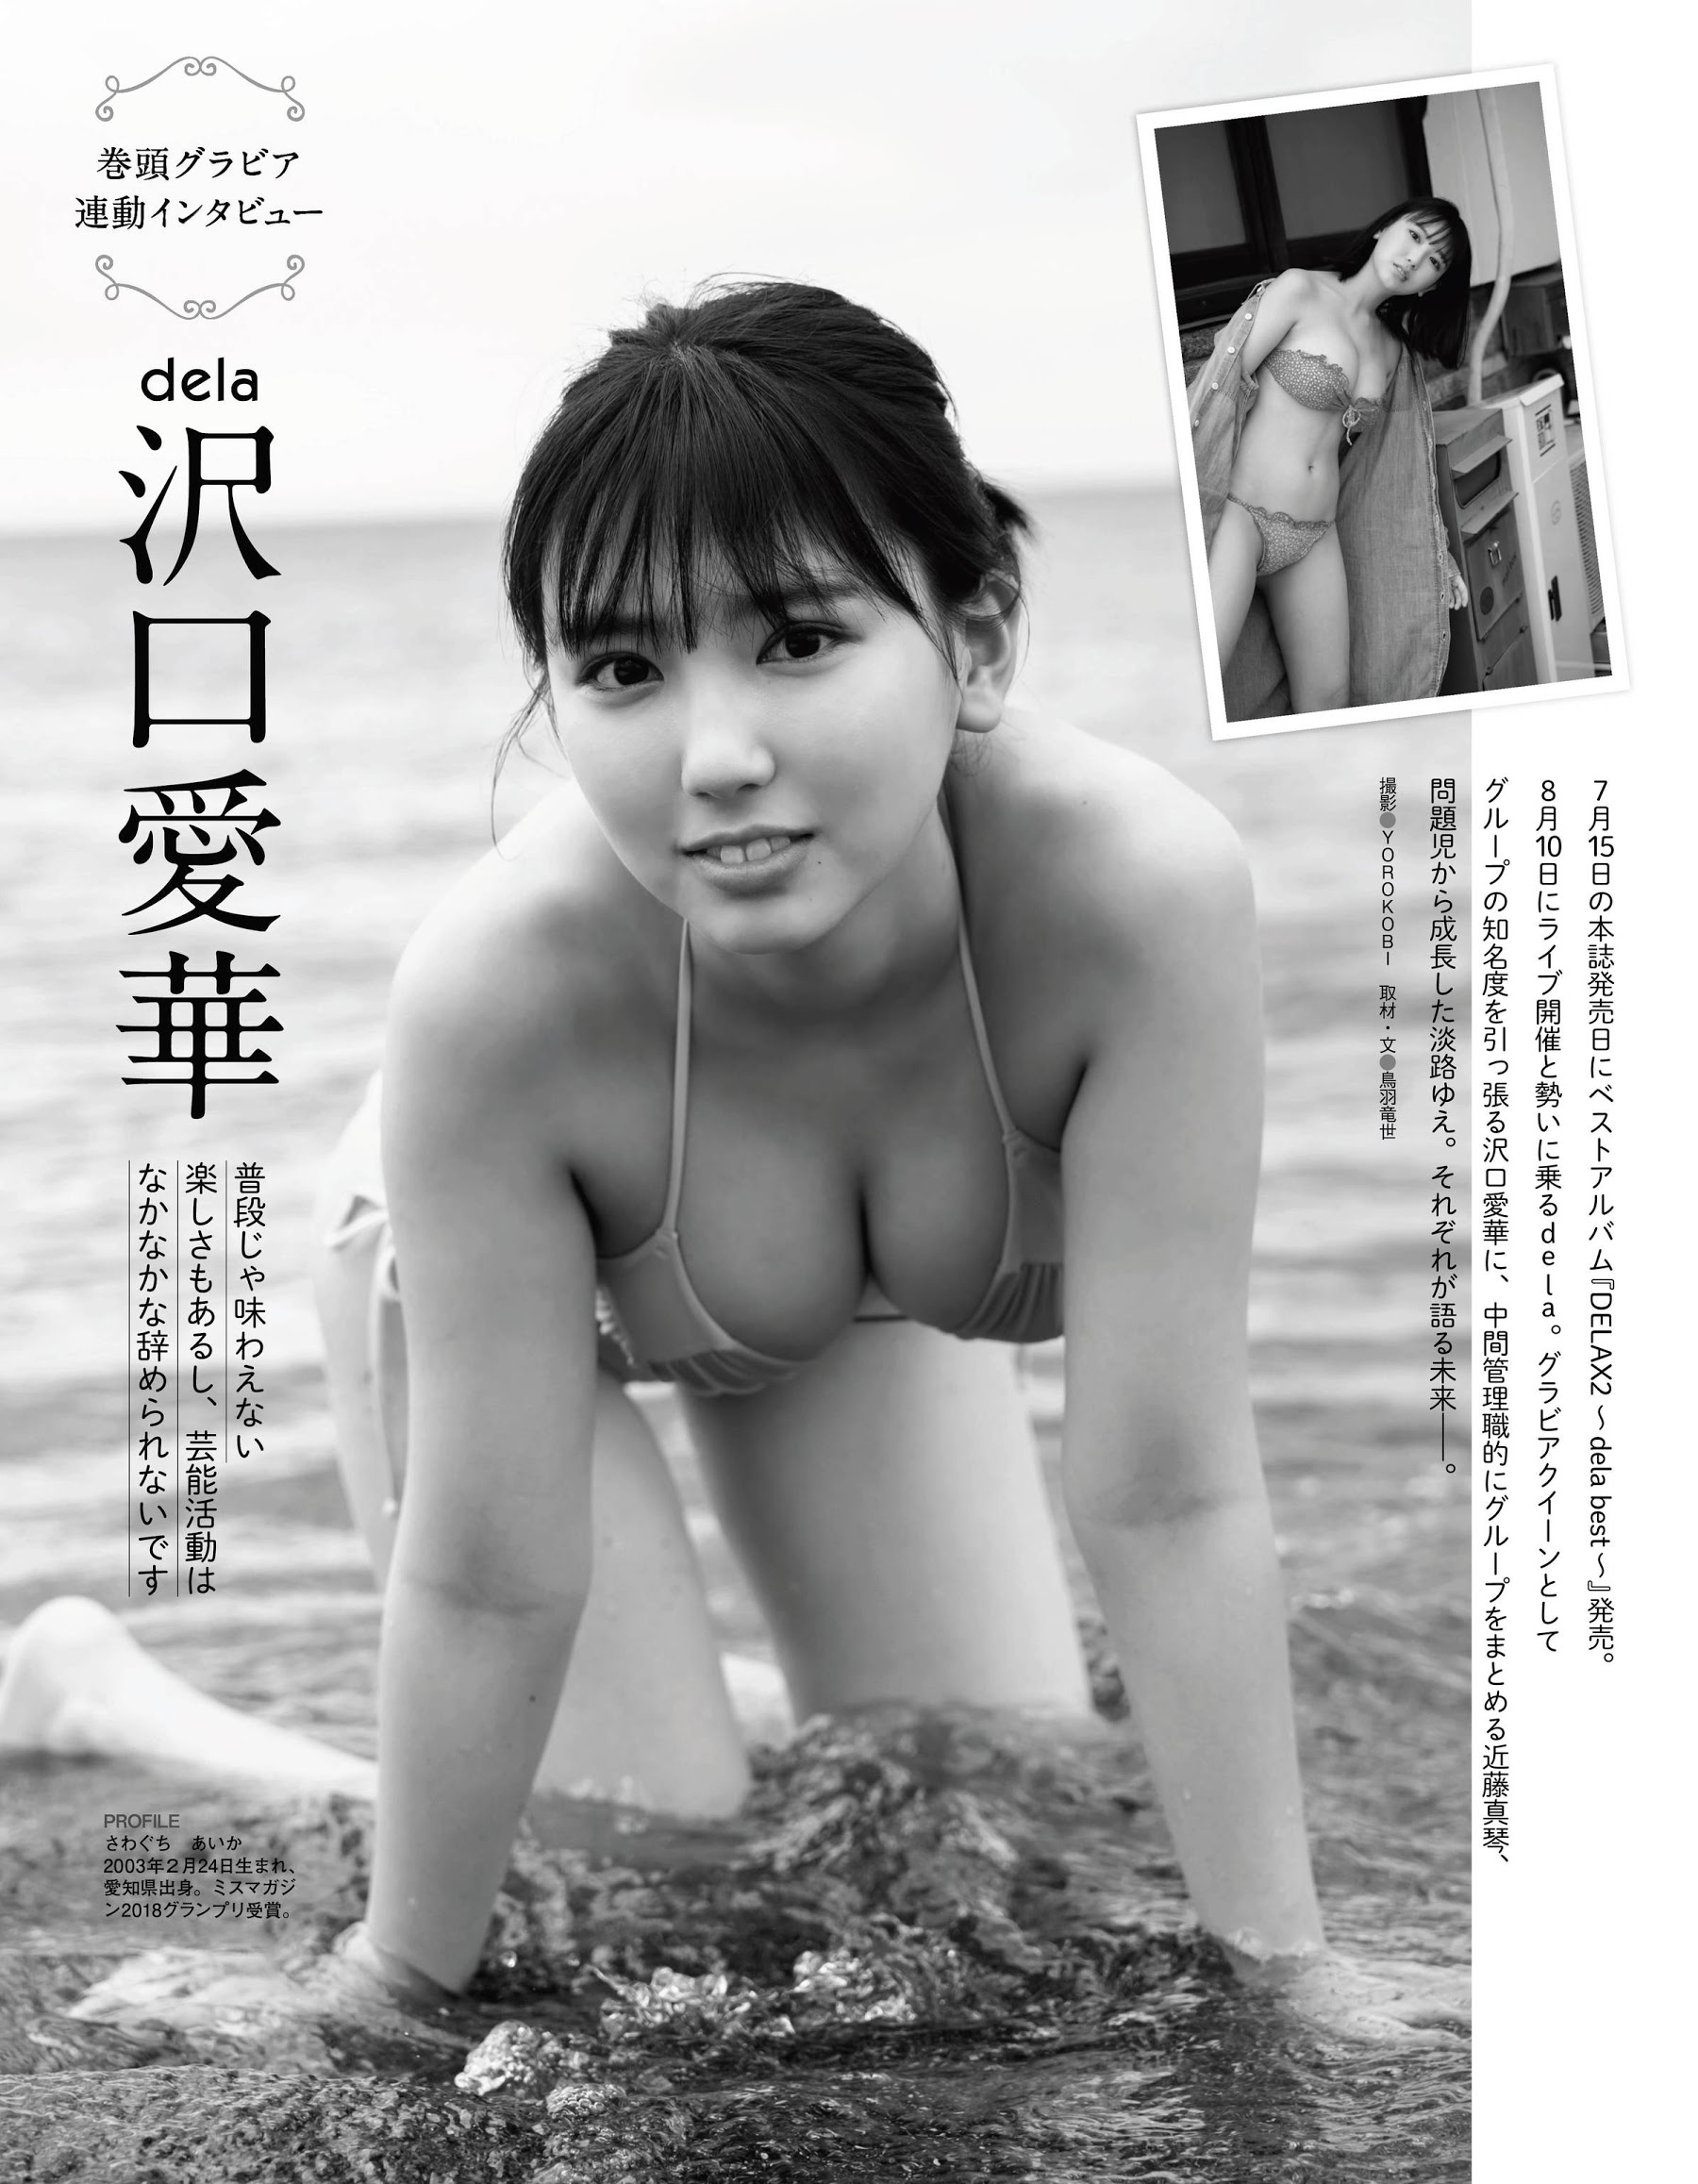 Reiwa gravure strongest JK Sawaguchi Aika 2020011